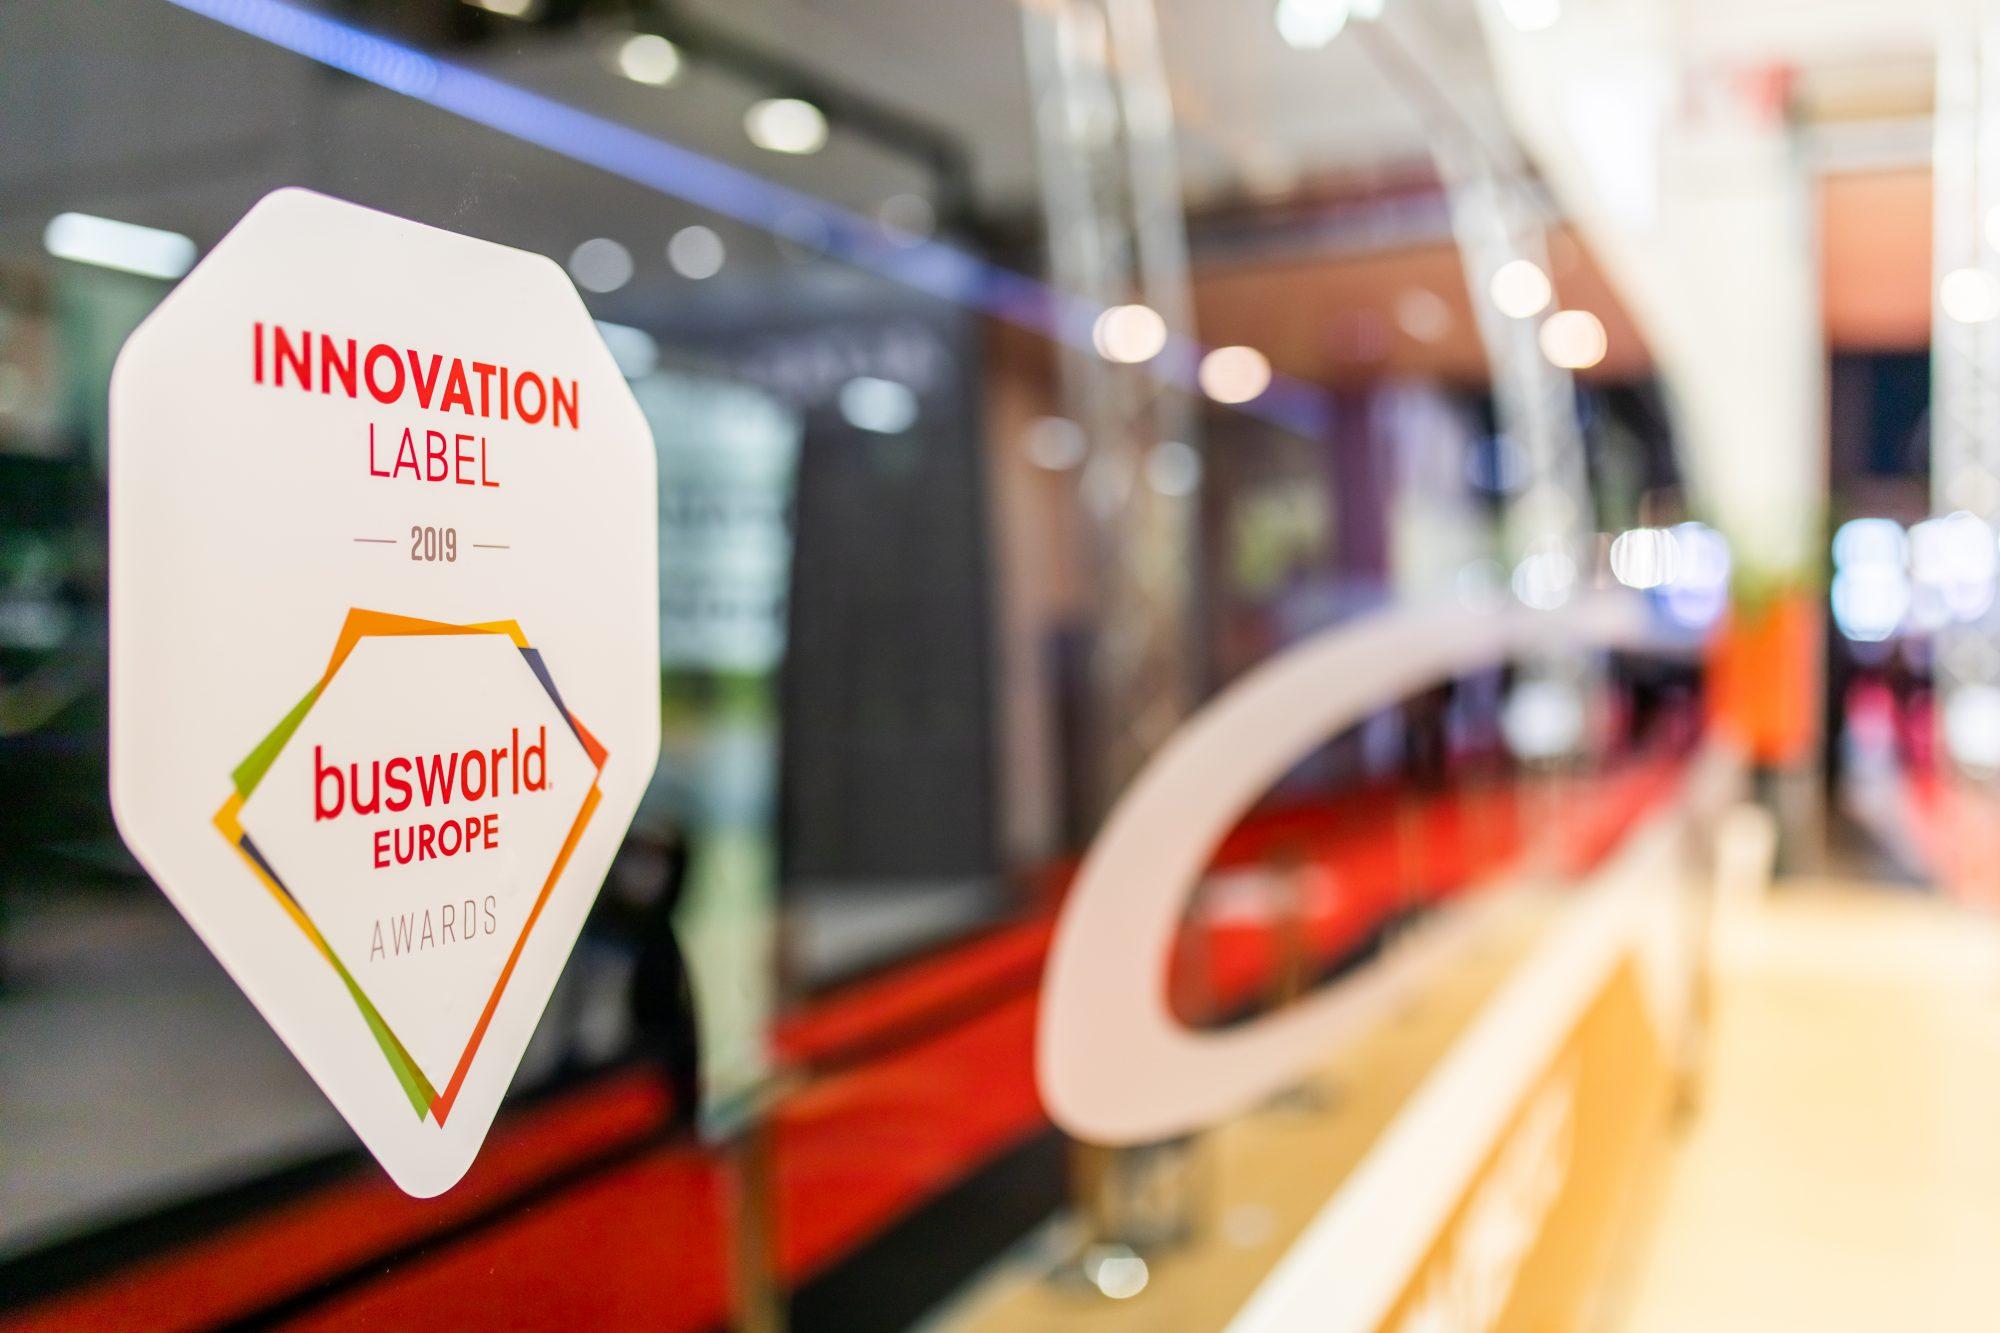 Ebusco 3.0 Innovation Buswolrd